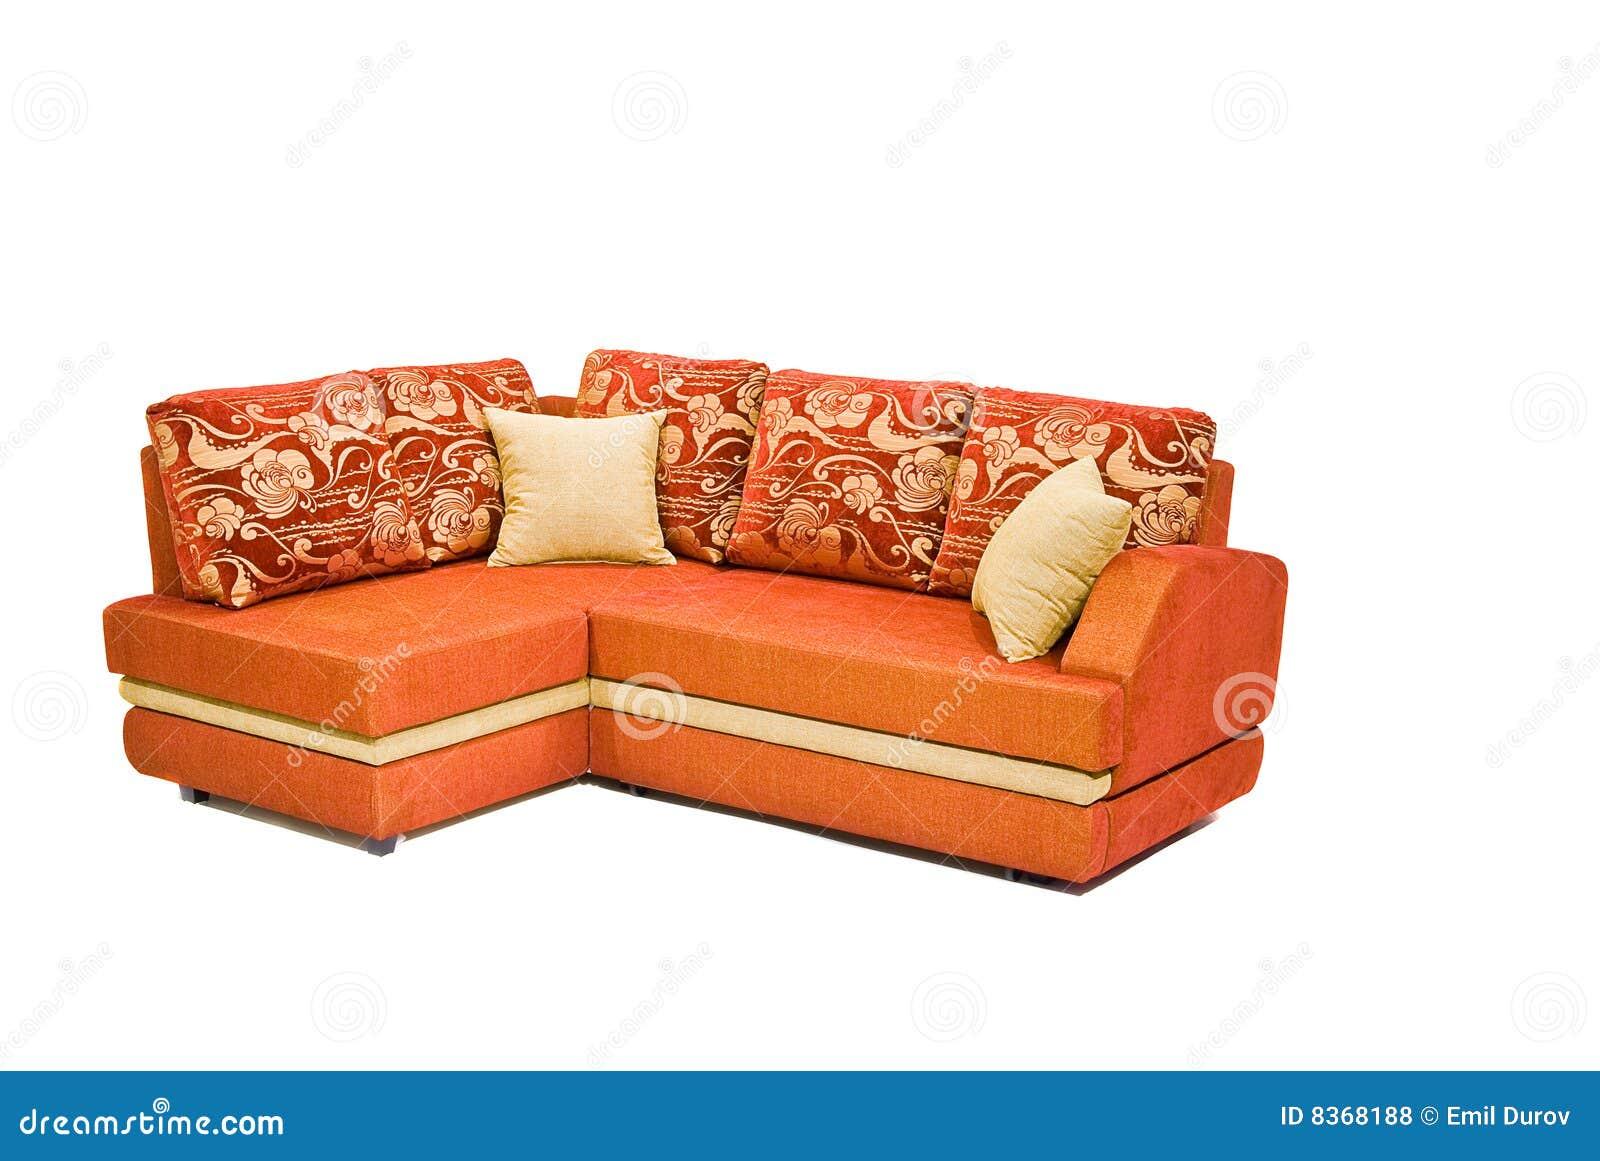 Sofá anaranjado moderno aislado en blanco